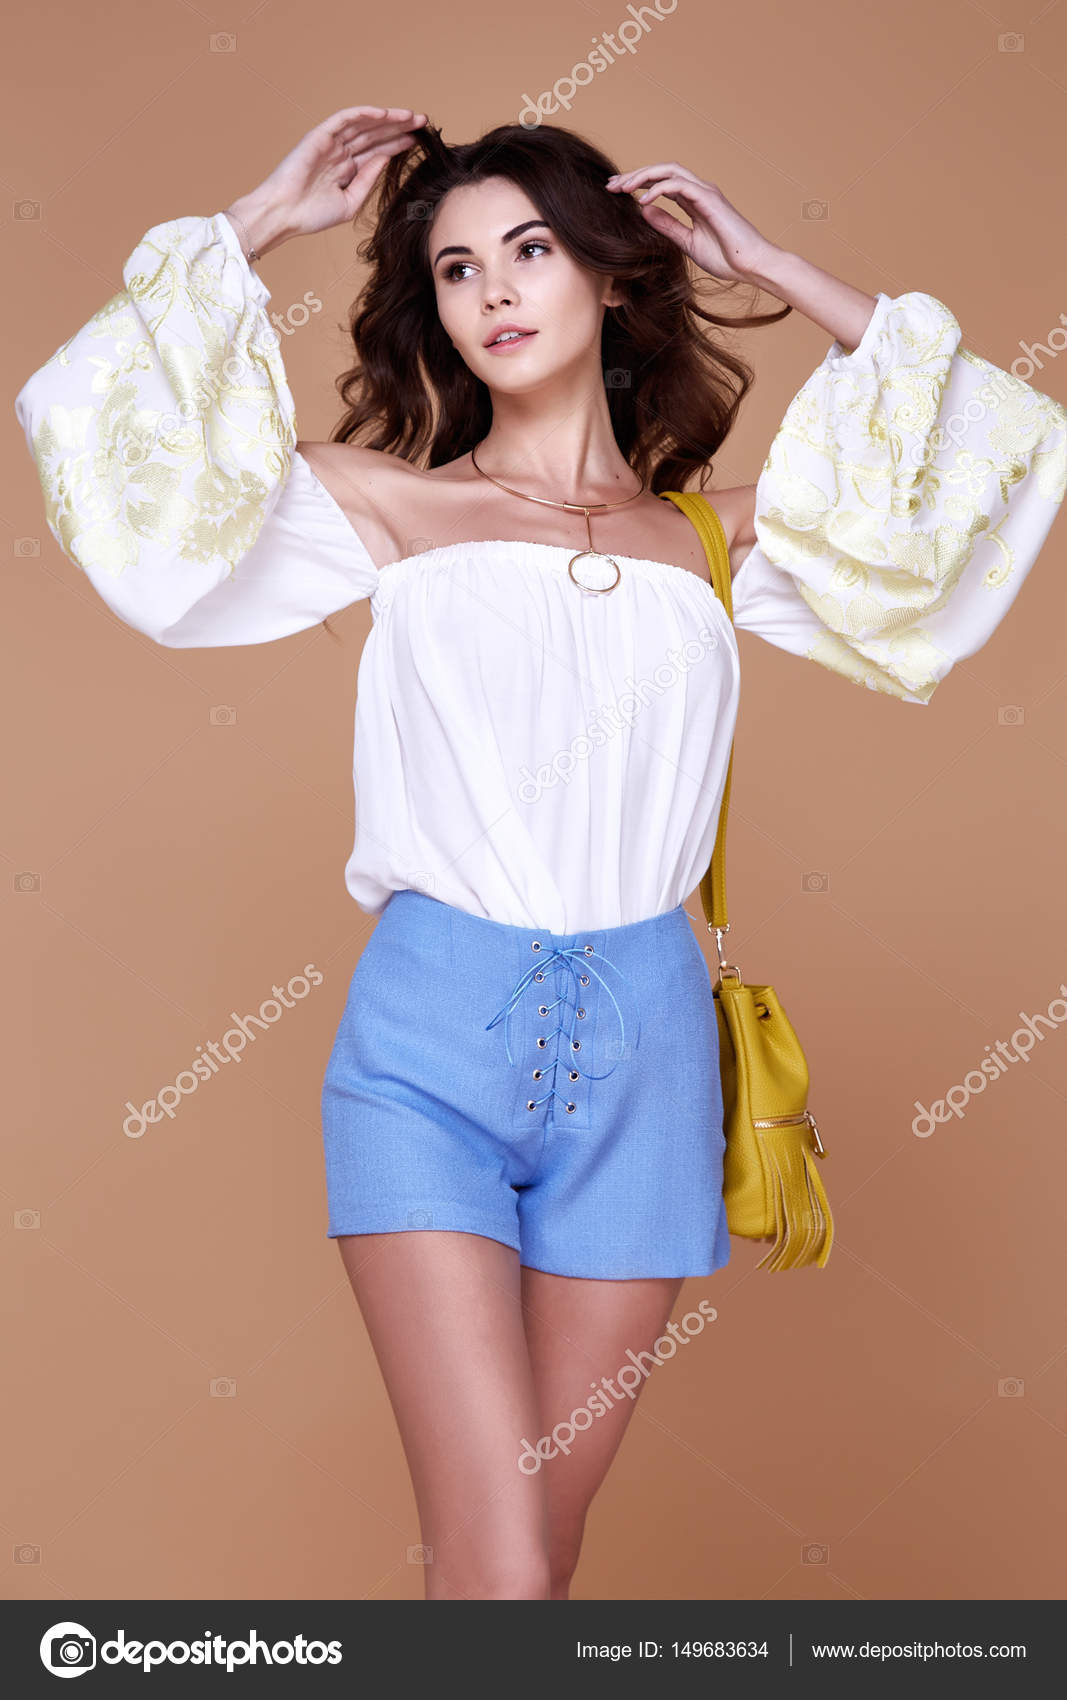 b7b1d405a533 Σέξι μελαχρινή γυναίκα φορούν κοντό μπλε βαμβακερό σύντομη και μετάξι  καλοκαίρι συλλογή μπλούζα τέλειο σώμα σχήμα δίαιτα δέρμα μαυρίσματος  κρατήστε αξεσουάρ ...